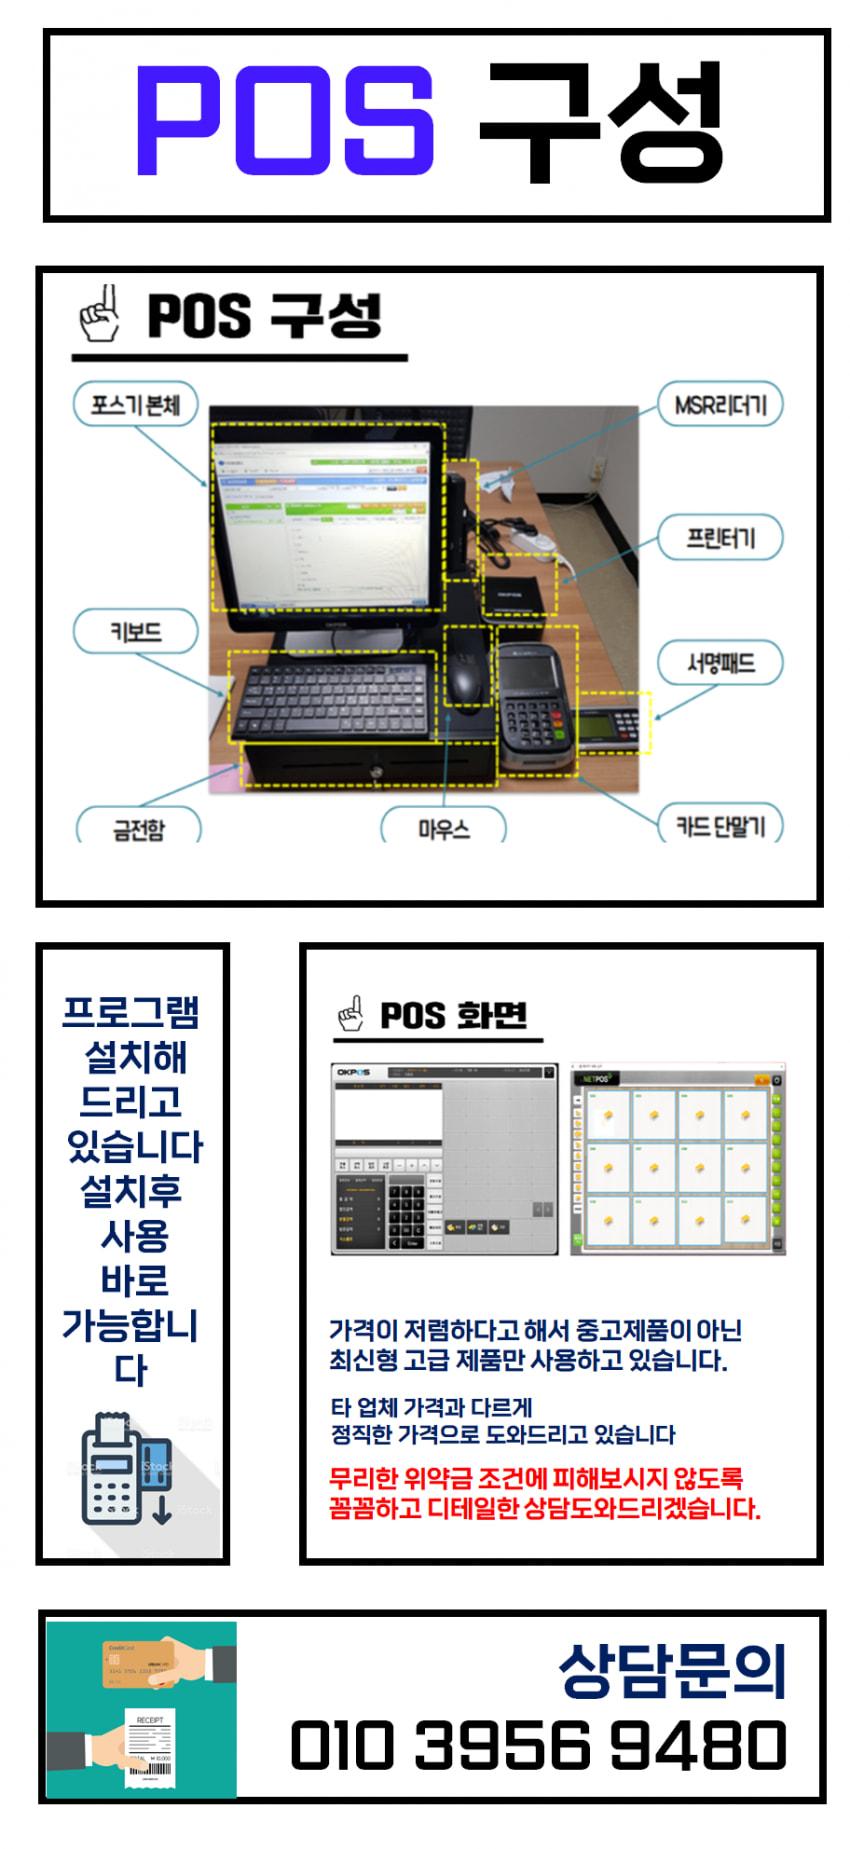 viewimage.php?id=7eee&no=24b0d769e1d32ca73fec81fa11d02831b46f6c3837711f4400726d62dc60220a829e8e639d169729730ab173abb49b8f479d9e05accb22c3343db80270